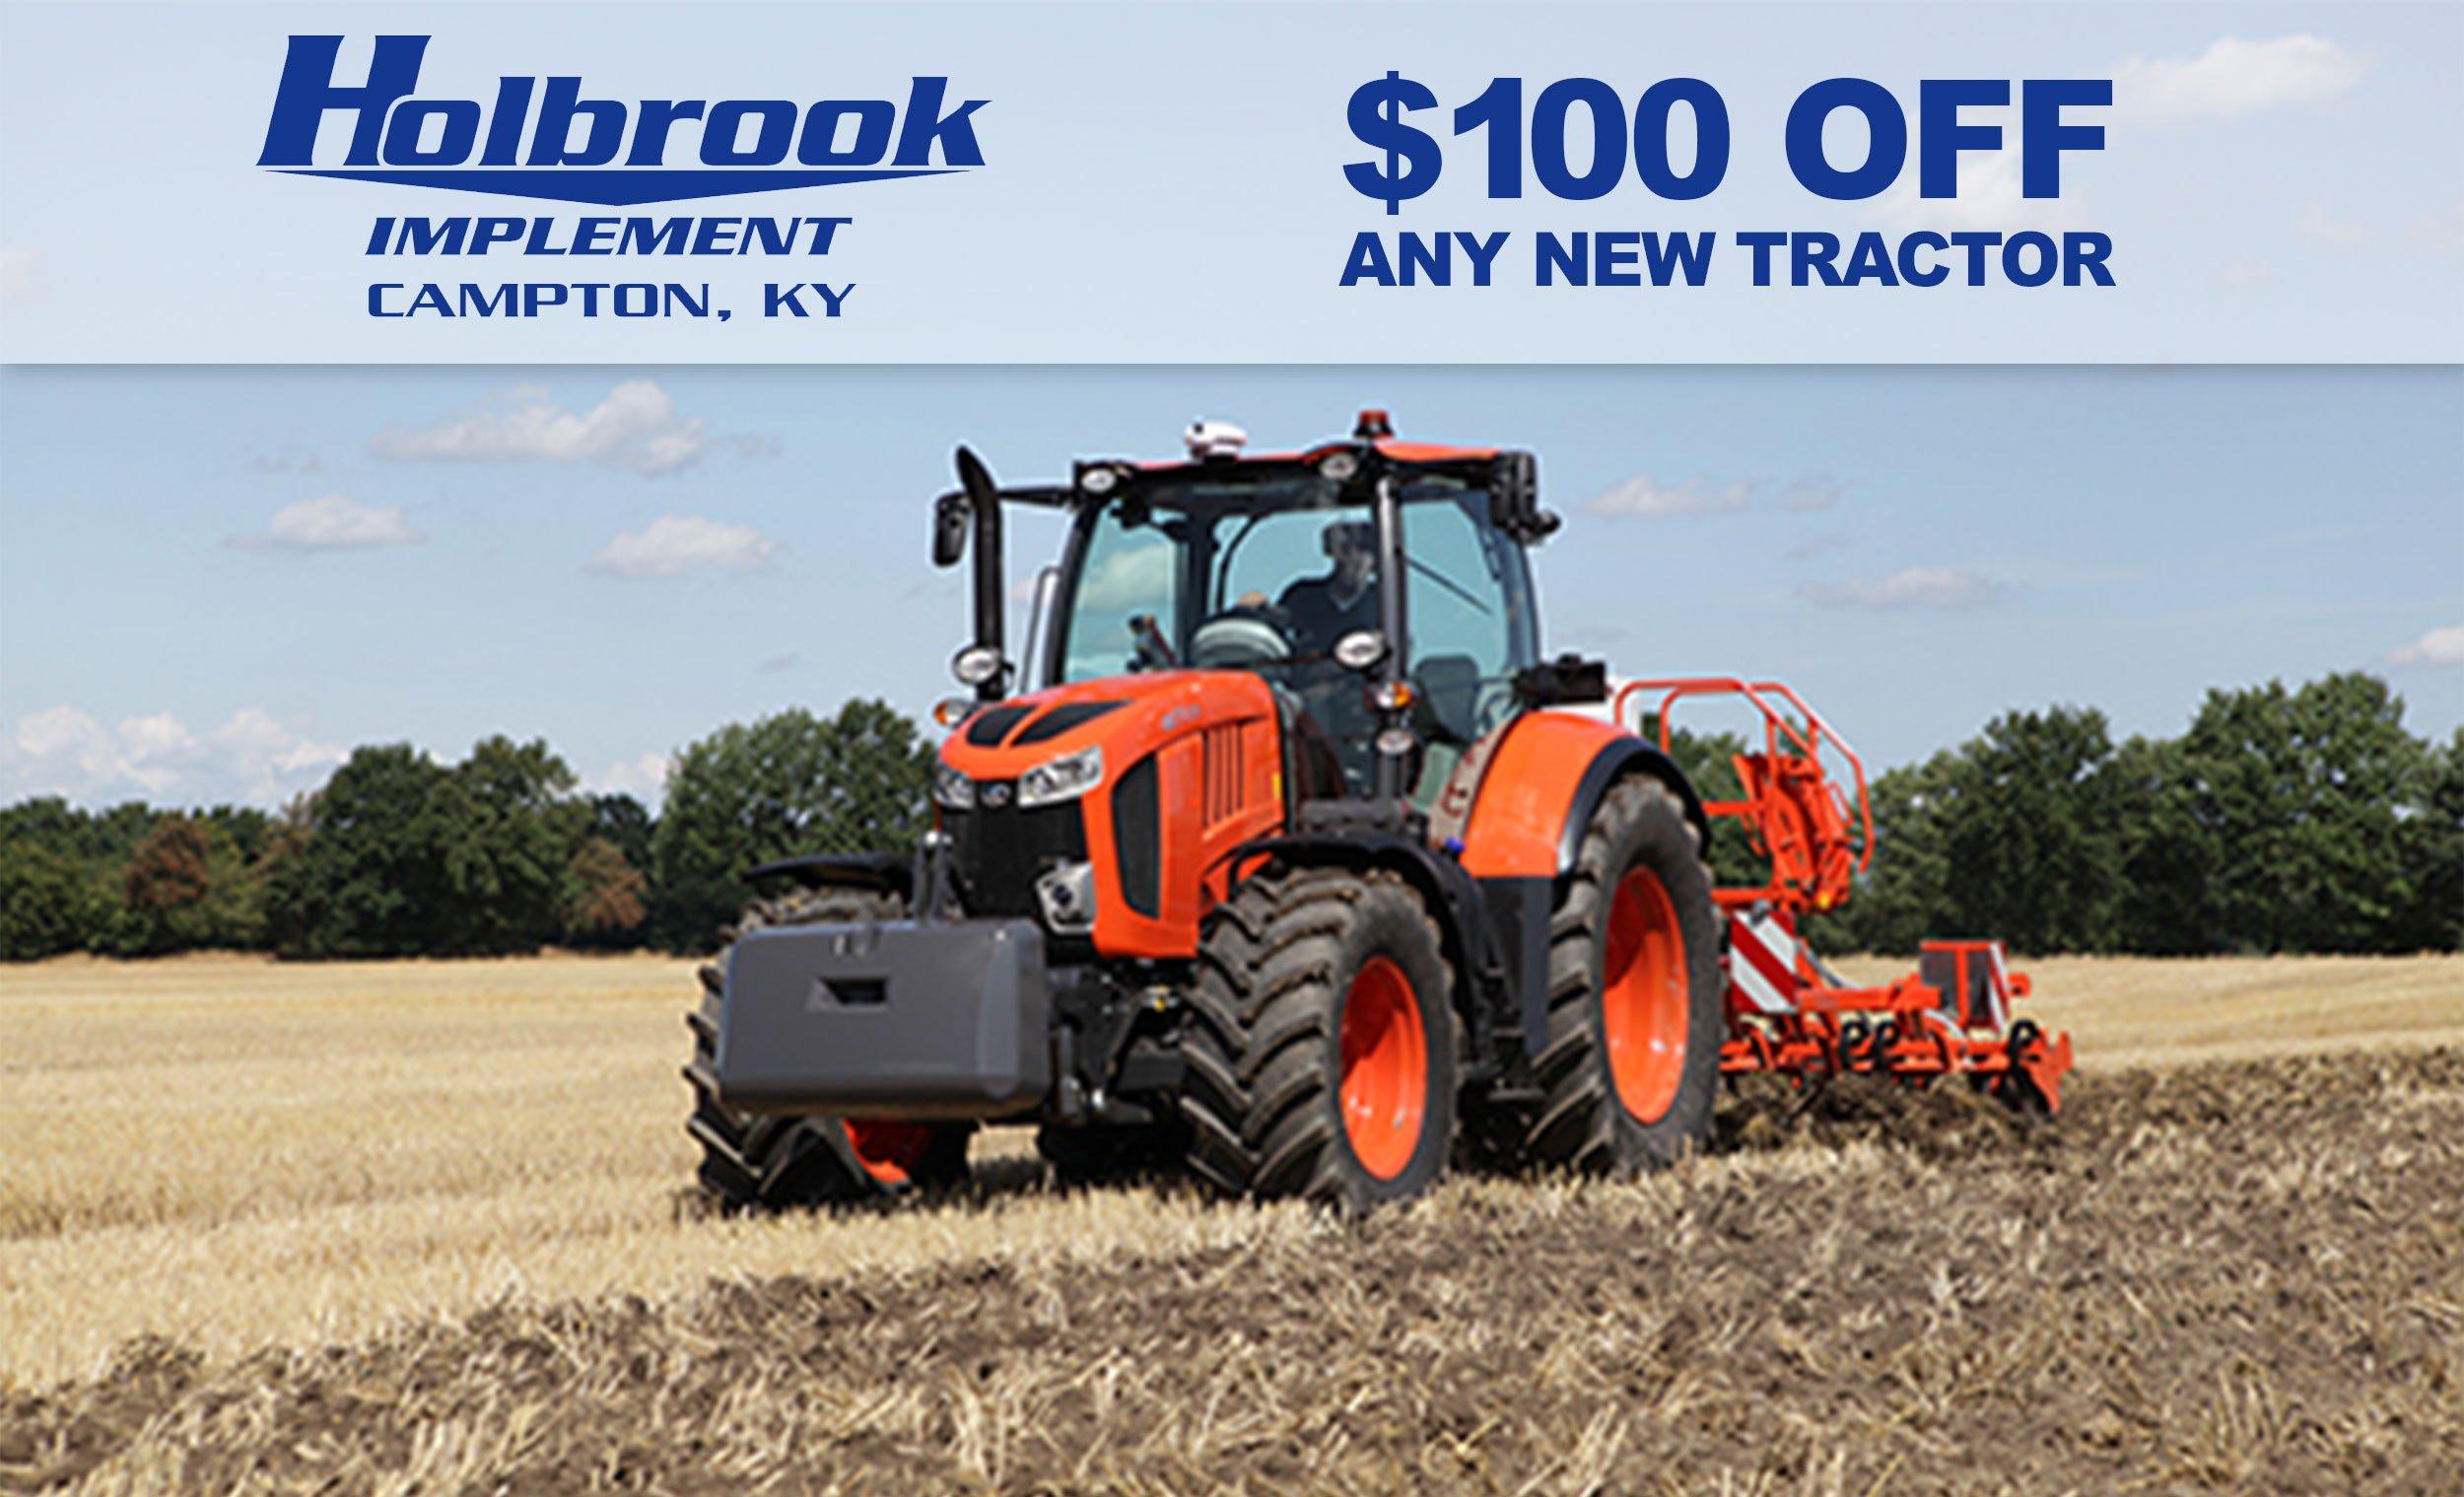 Kubota tractors for sale in kentucky - 2e91bdd4ae9c1505748942 100offtractornewlogoholbrookimp Jpg